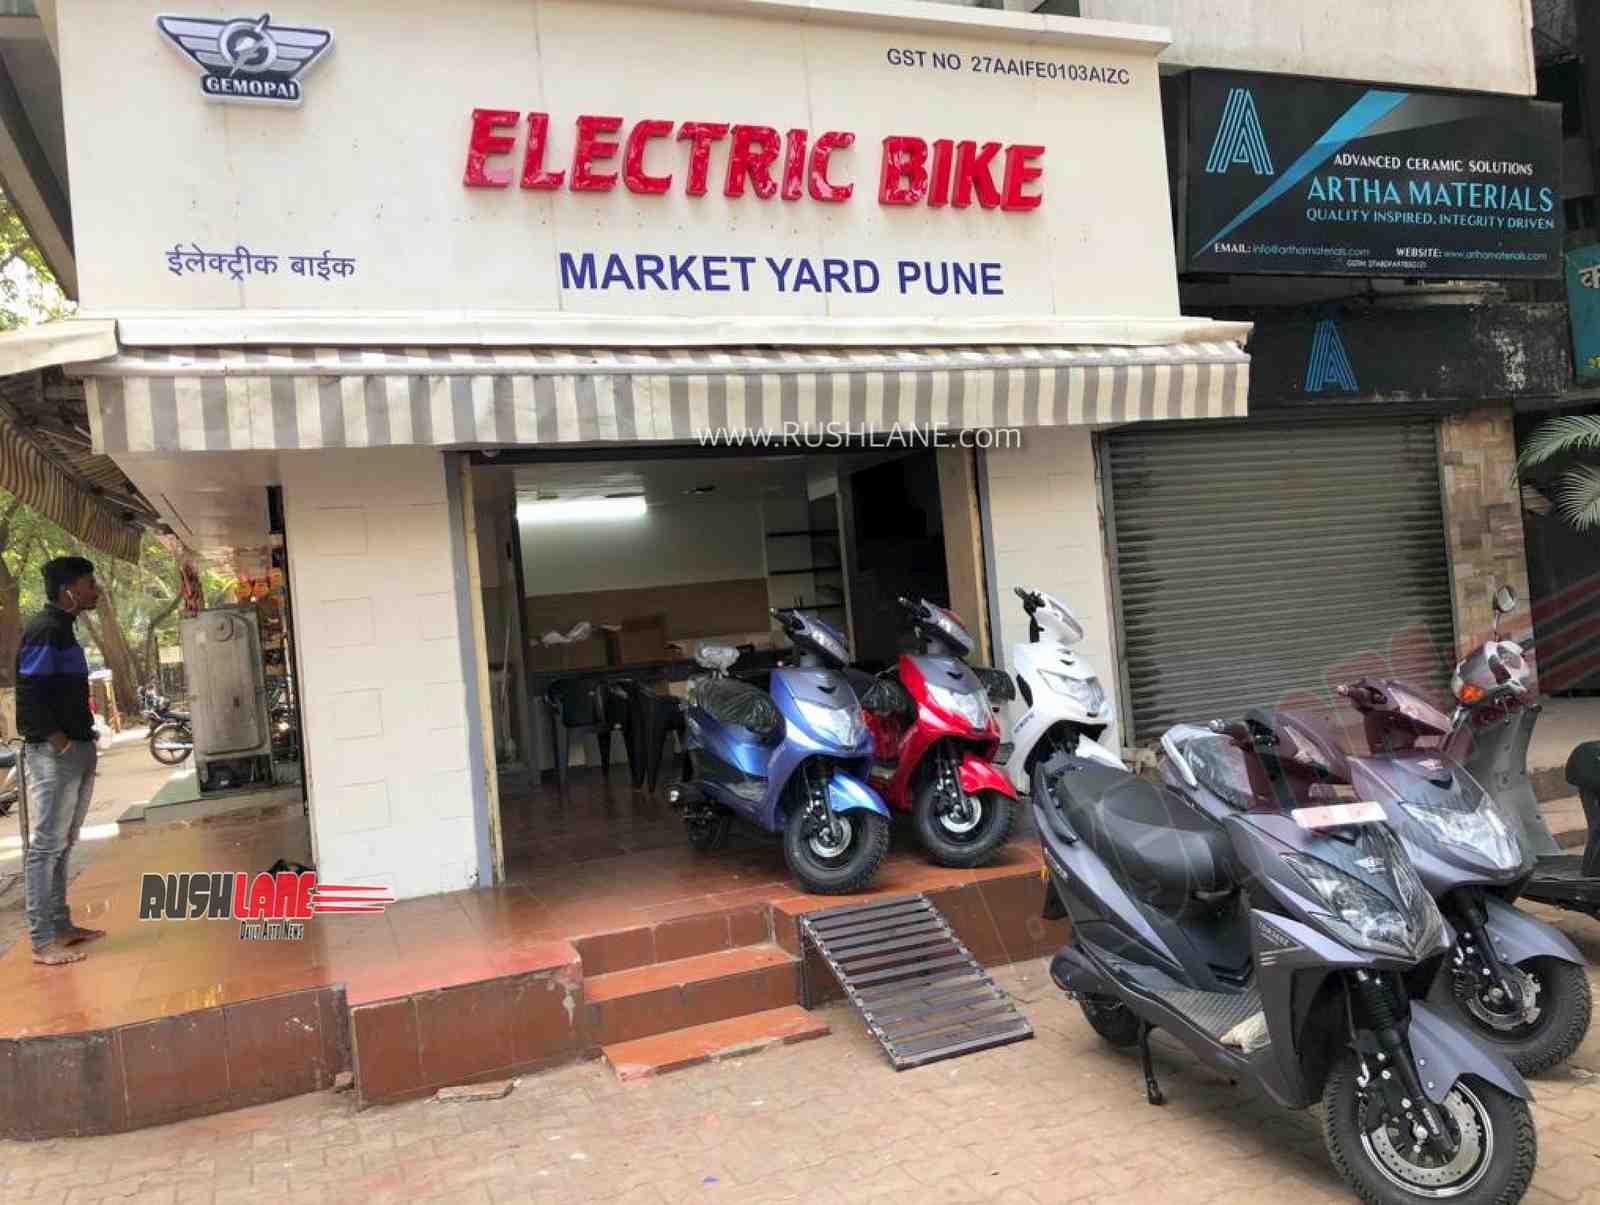 Gemopai electric scooters